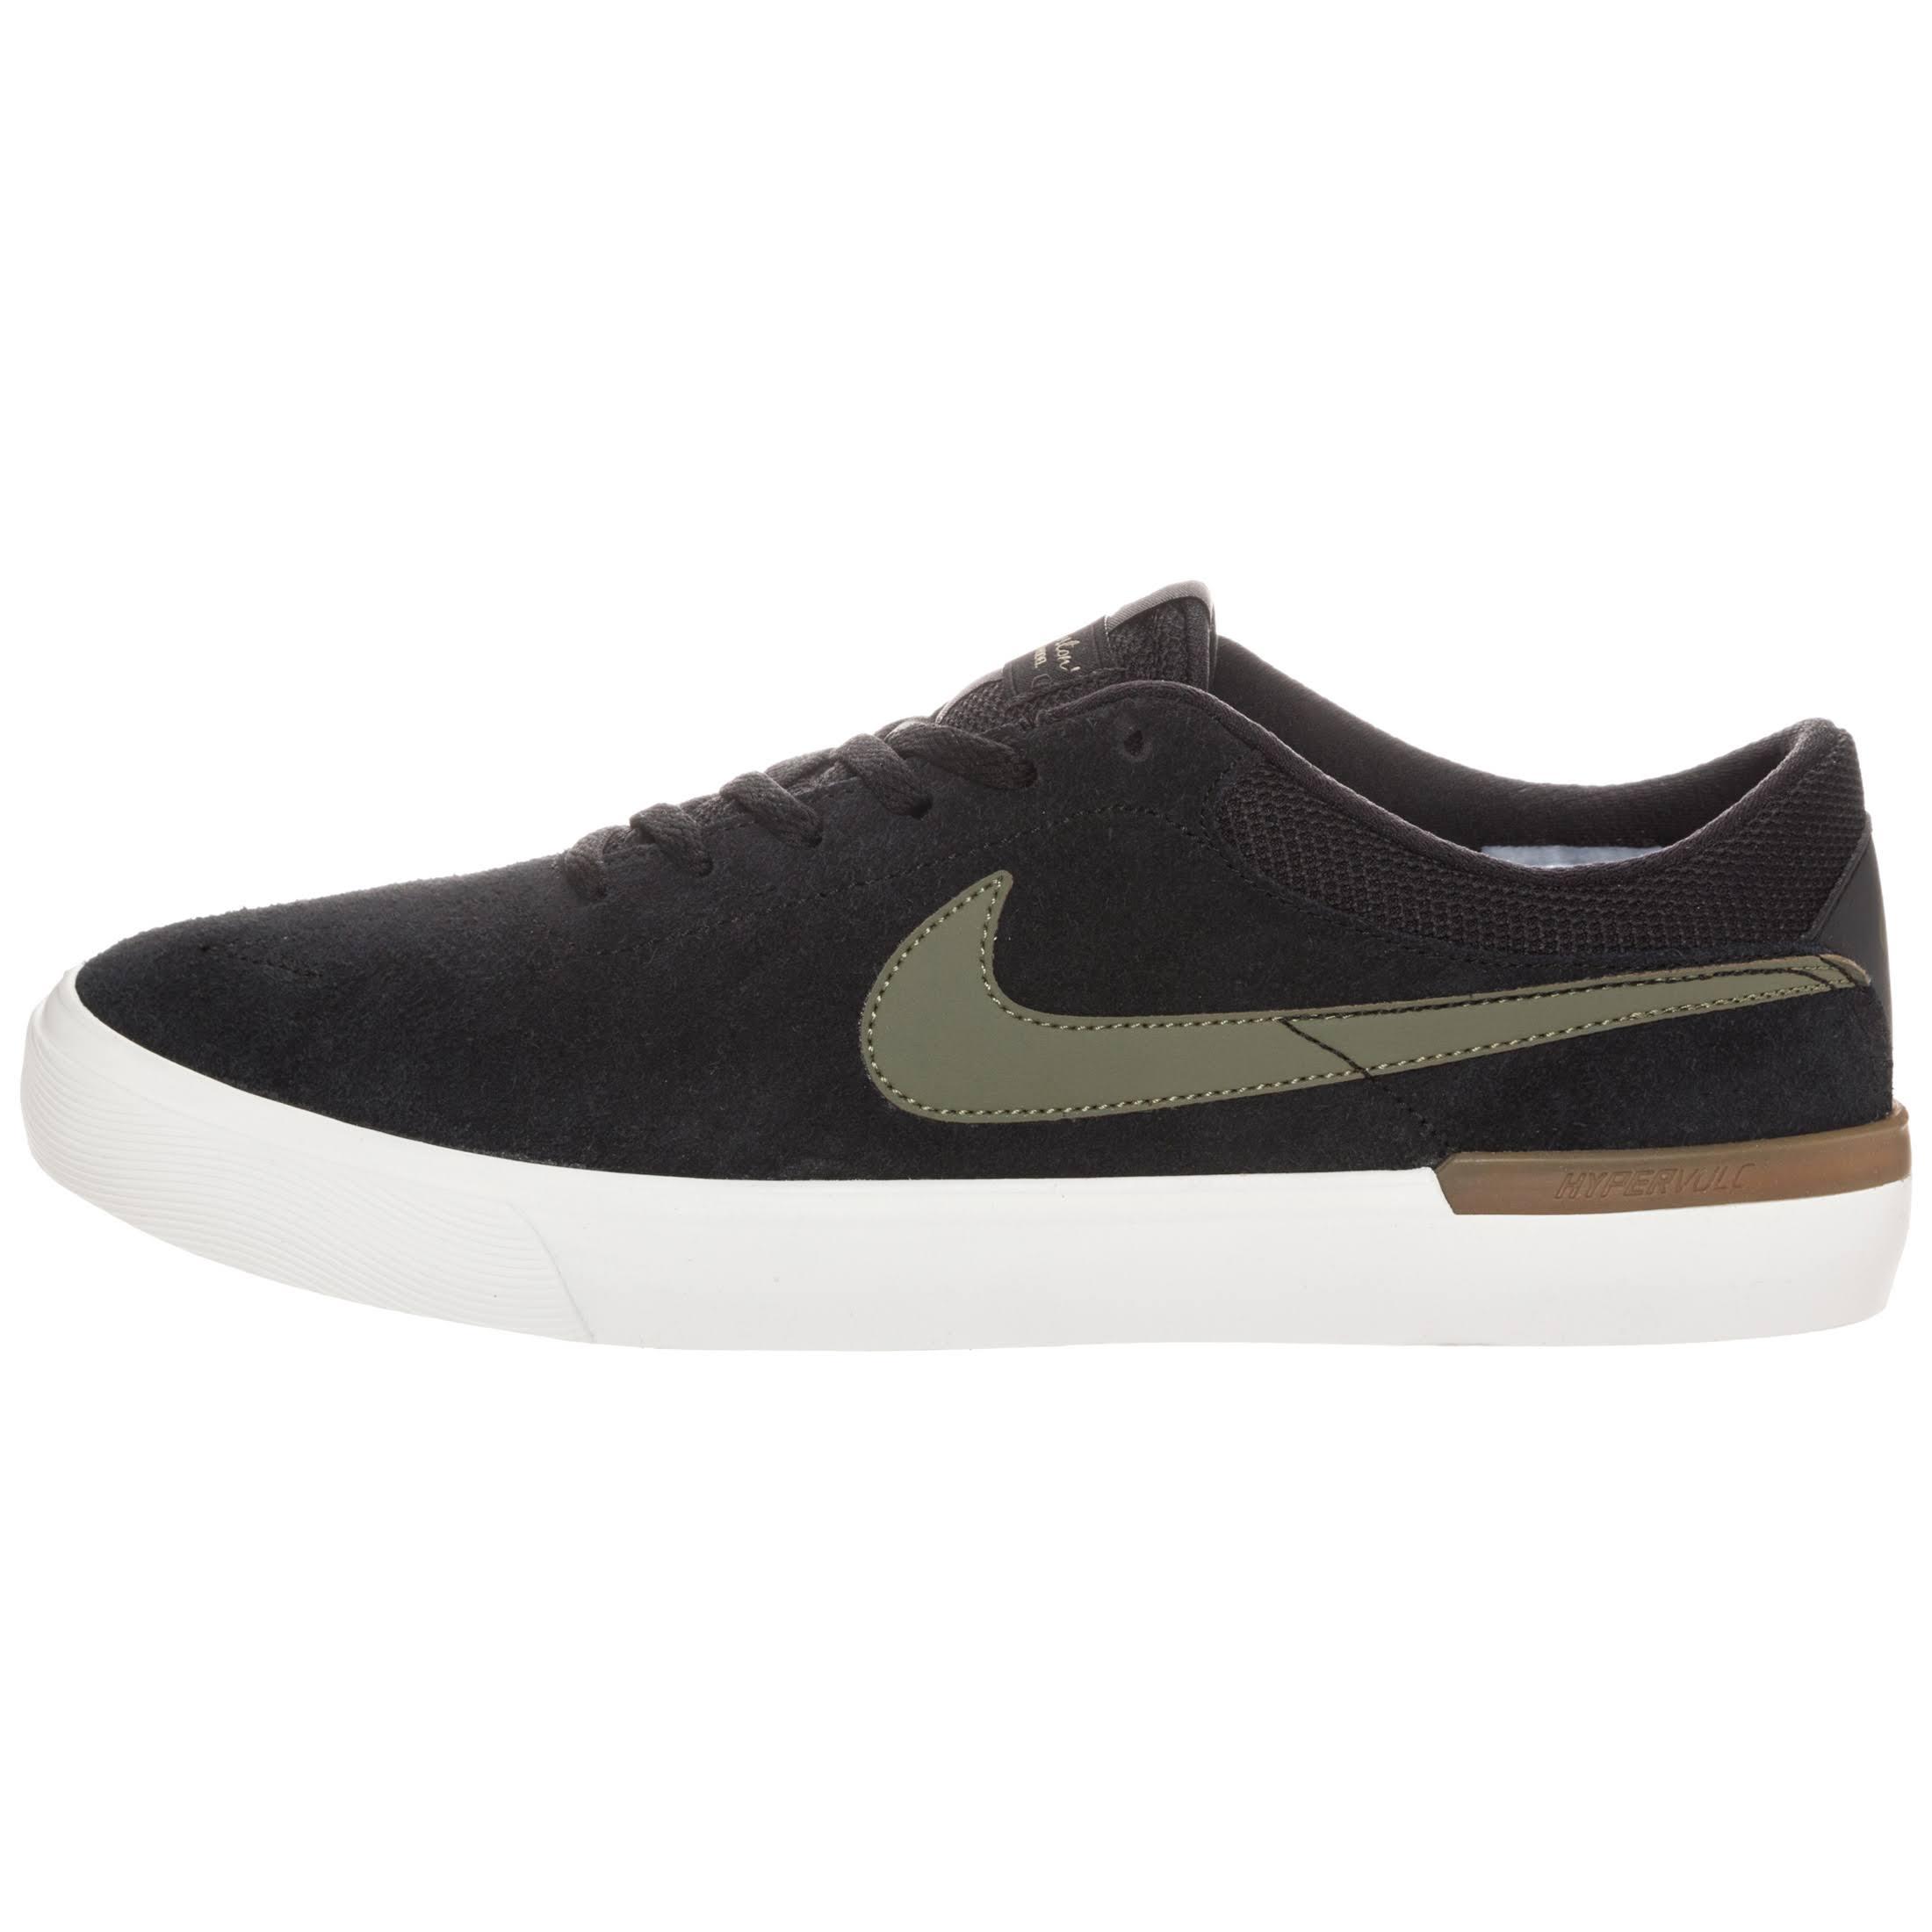 Größe Black Schuh 7 Olive Medium Koston Us Herren Nike Hypervulc Sb Fw8qUApA